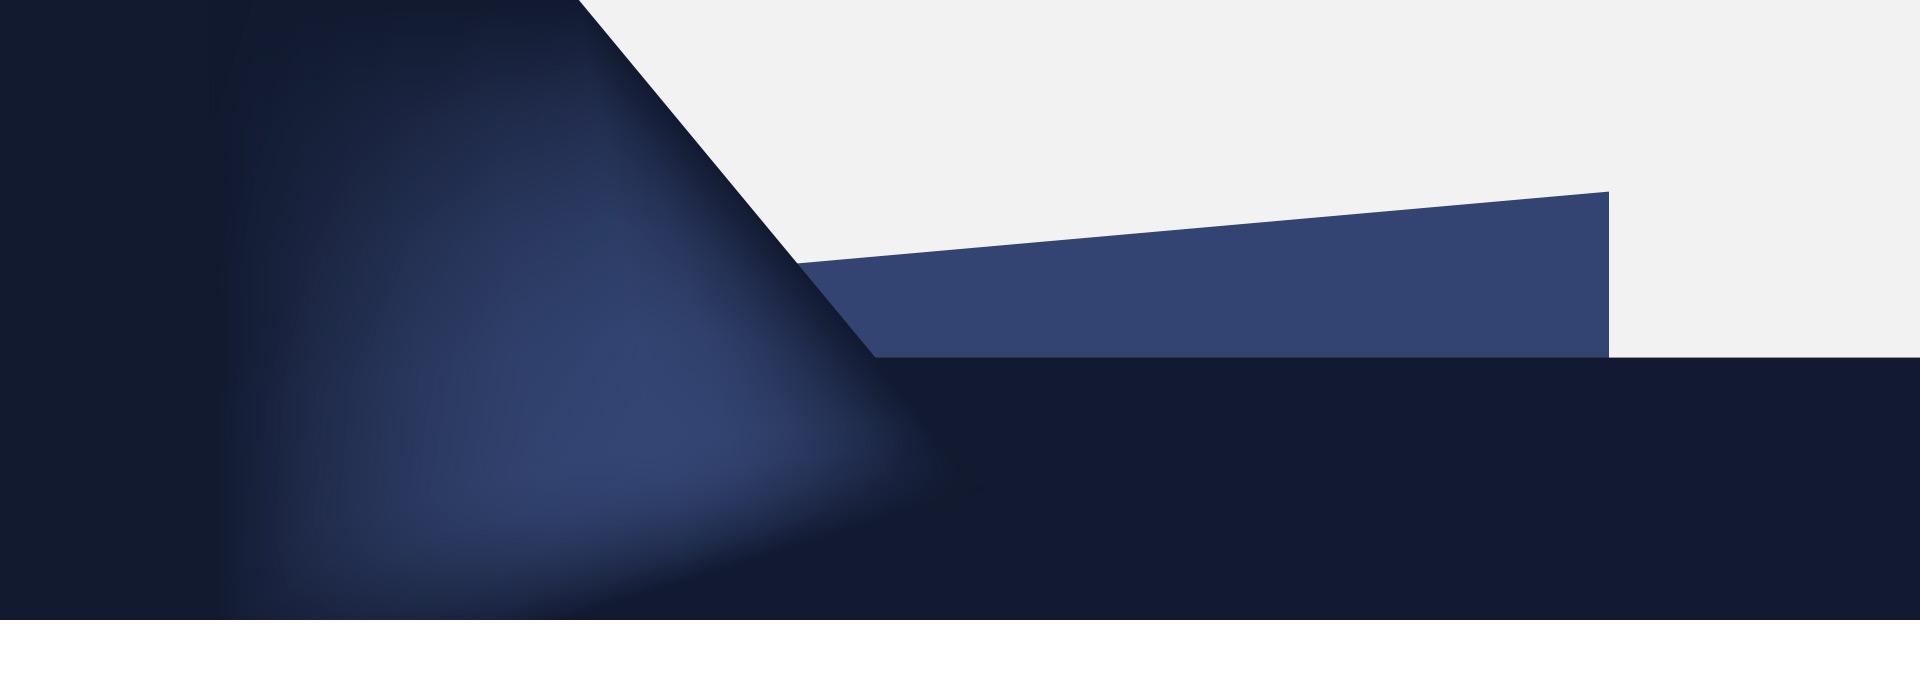 http://www.uned.cr/sites/default/files/revslider/image/encuesta_guesss_bg.jpg